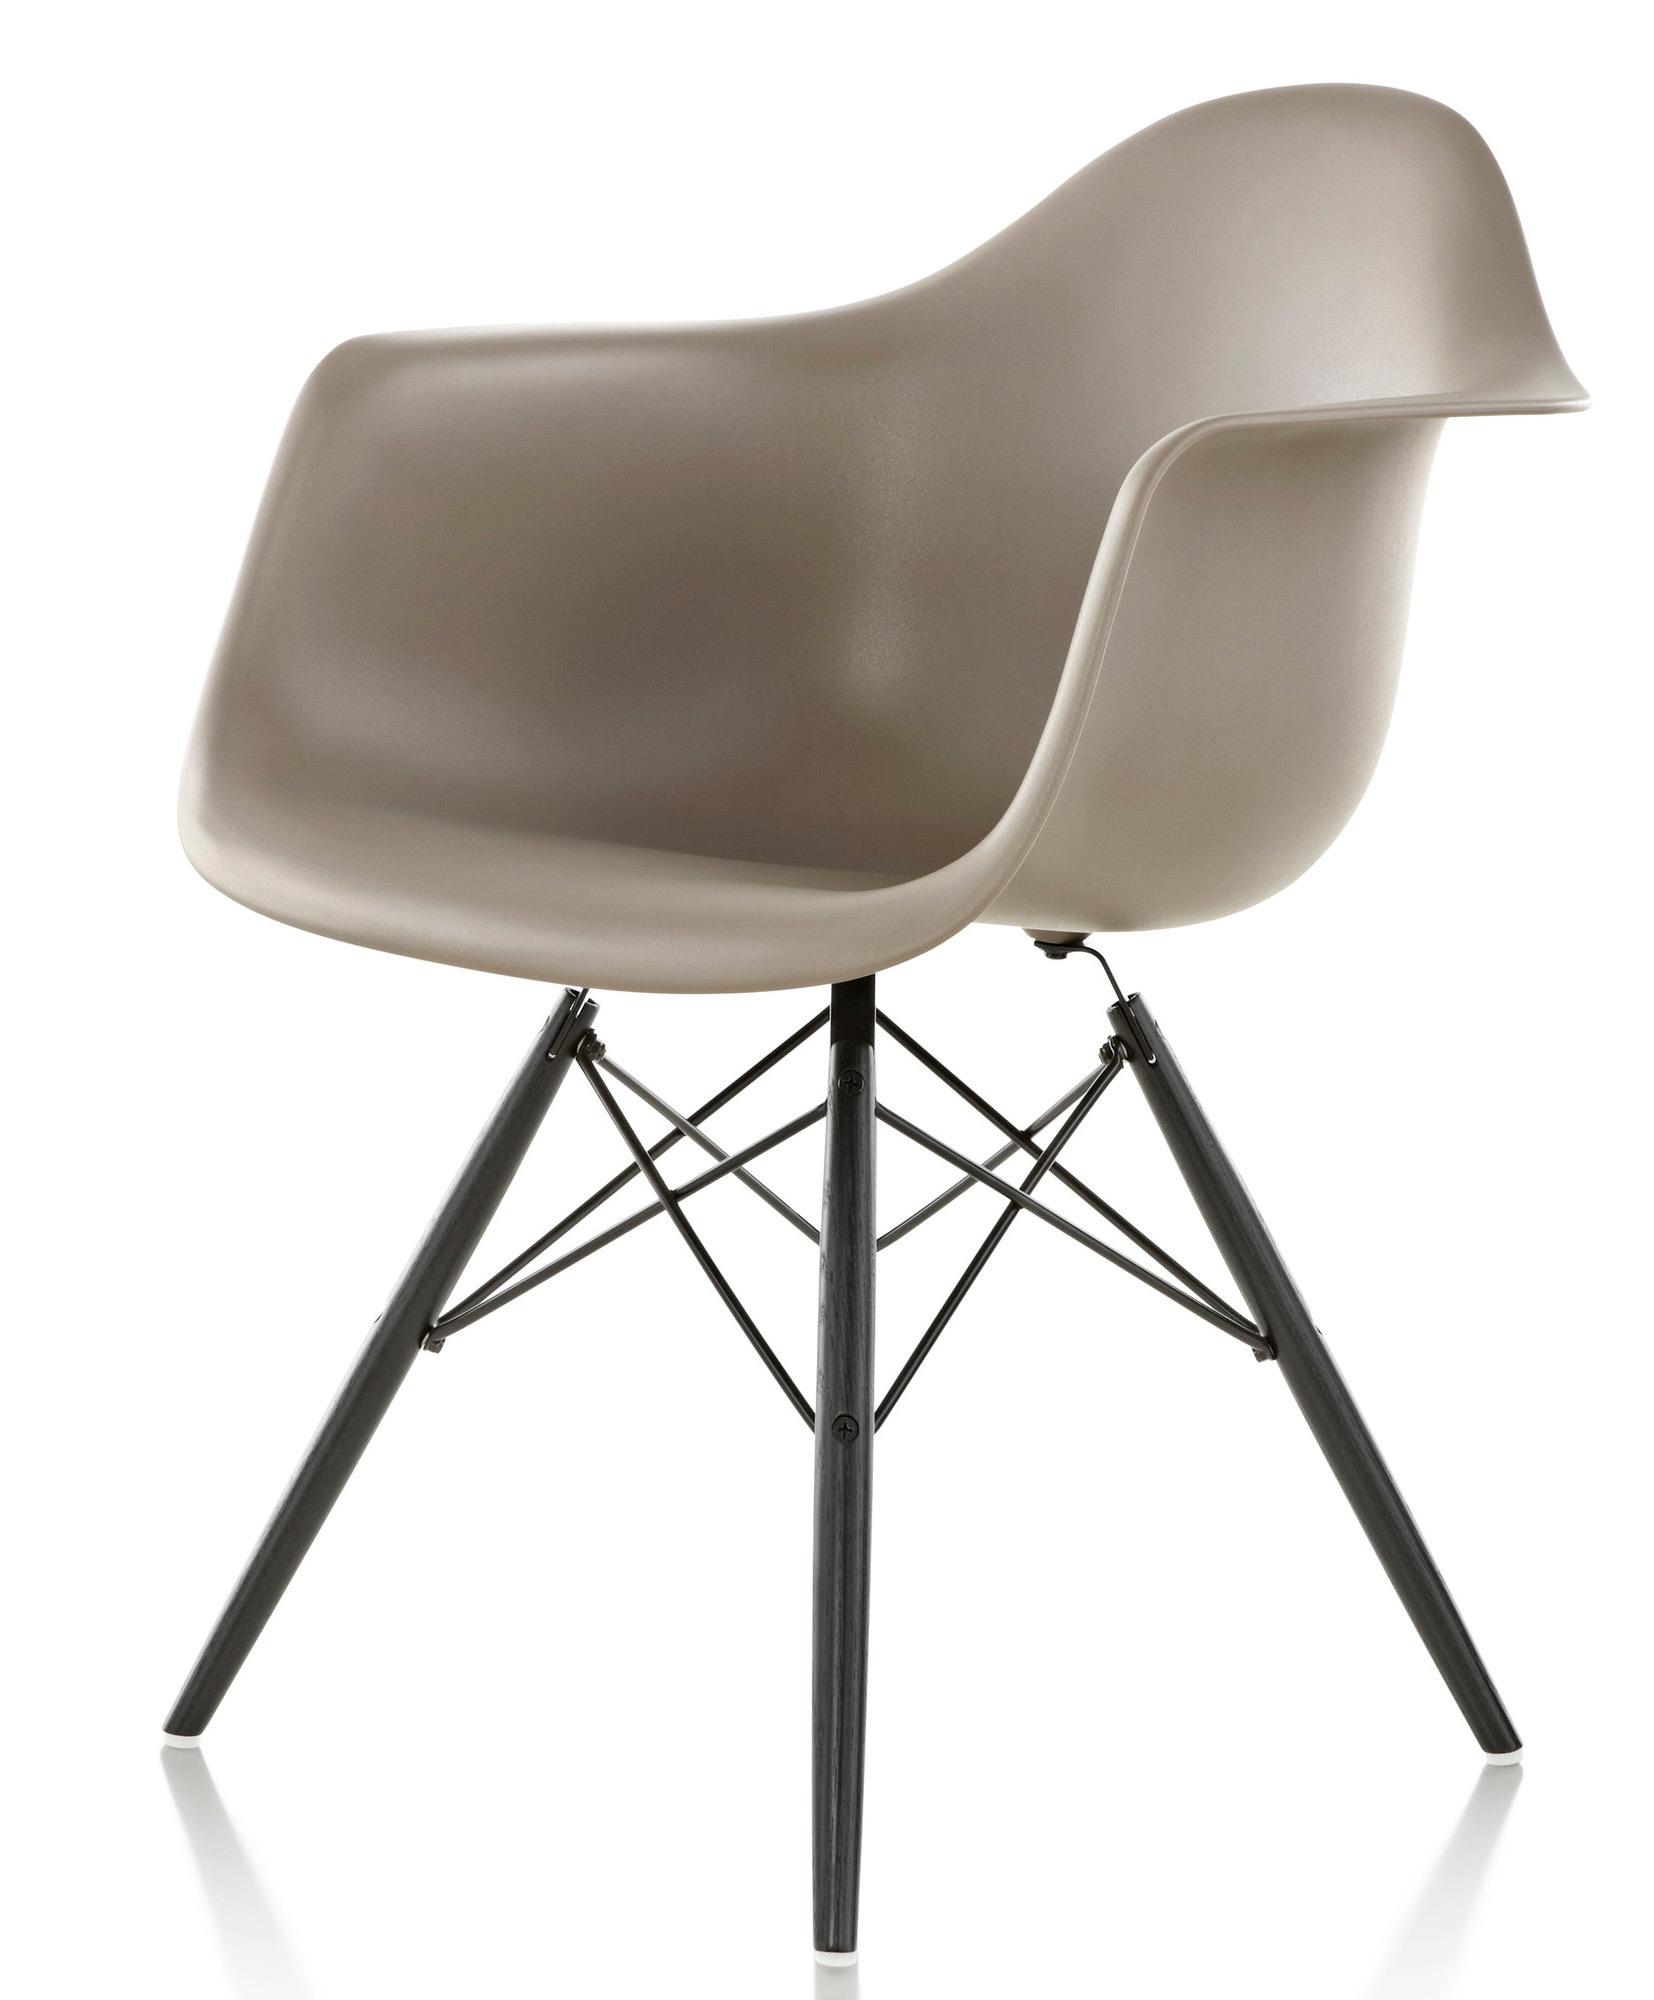 Herman miller eames molded plastic armchair gr shop canada for Eames plastic armchair gunstig